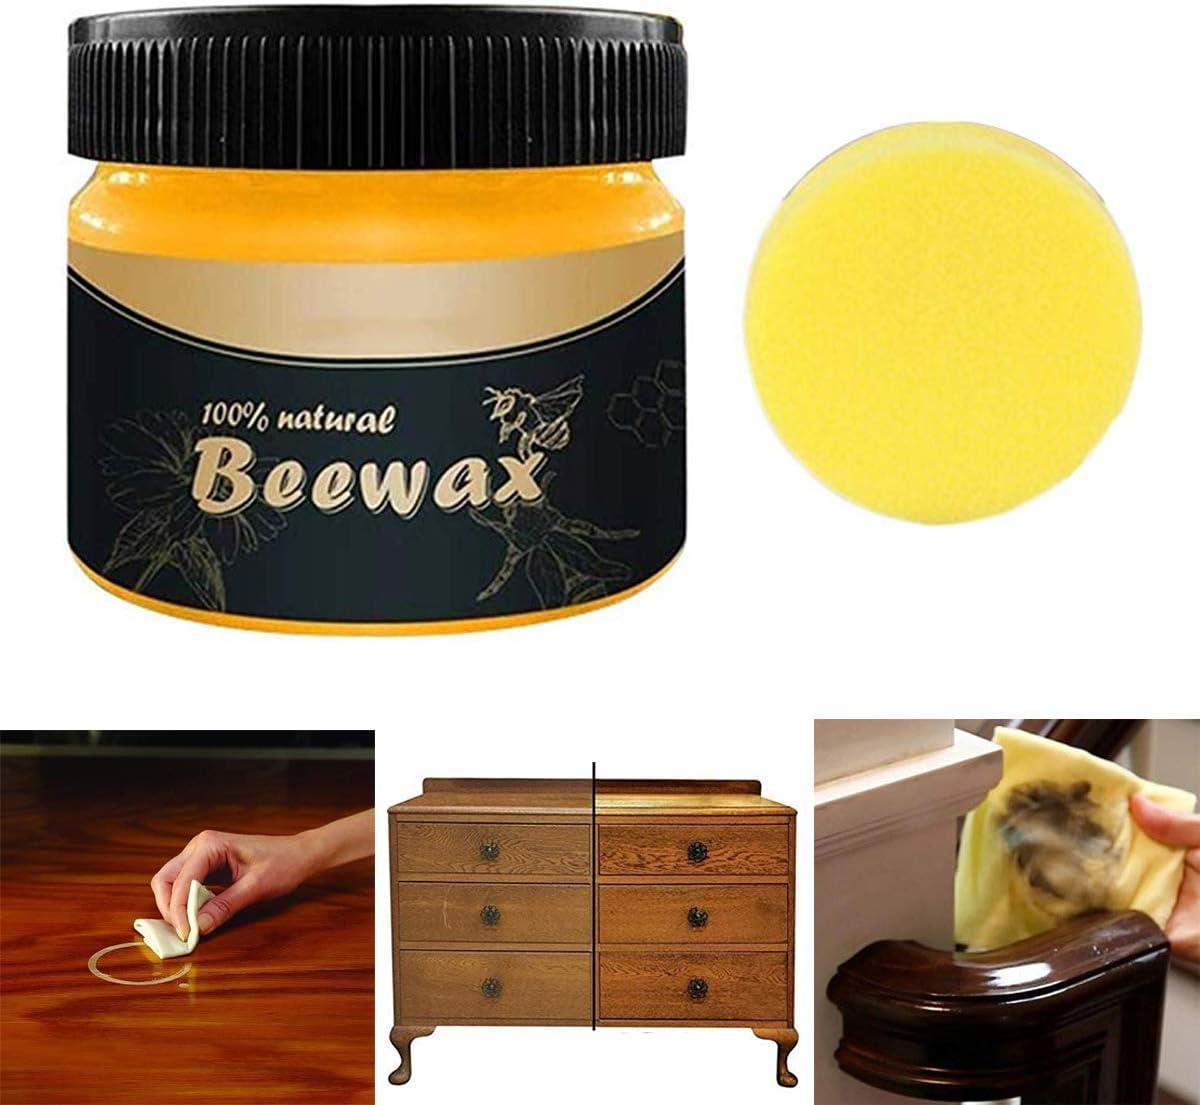 Beeswax Furniture Polish,Wood Seasoning Beewax - Natural Wood Wax Traditional Beeswax Polish for Wood & Furniture,Beewax Wood Polish and Cleaner for Furniture Care